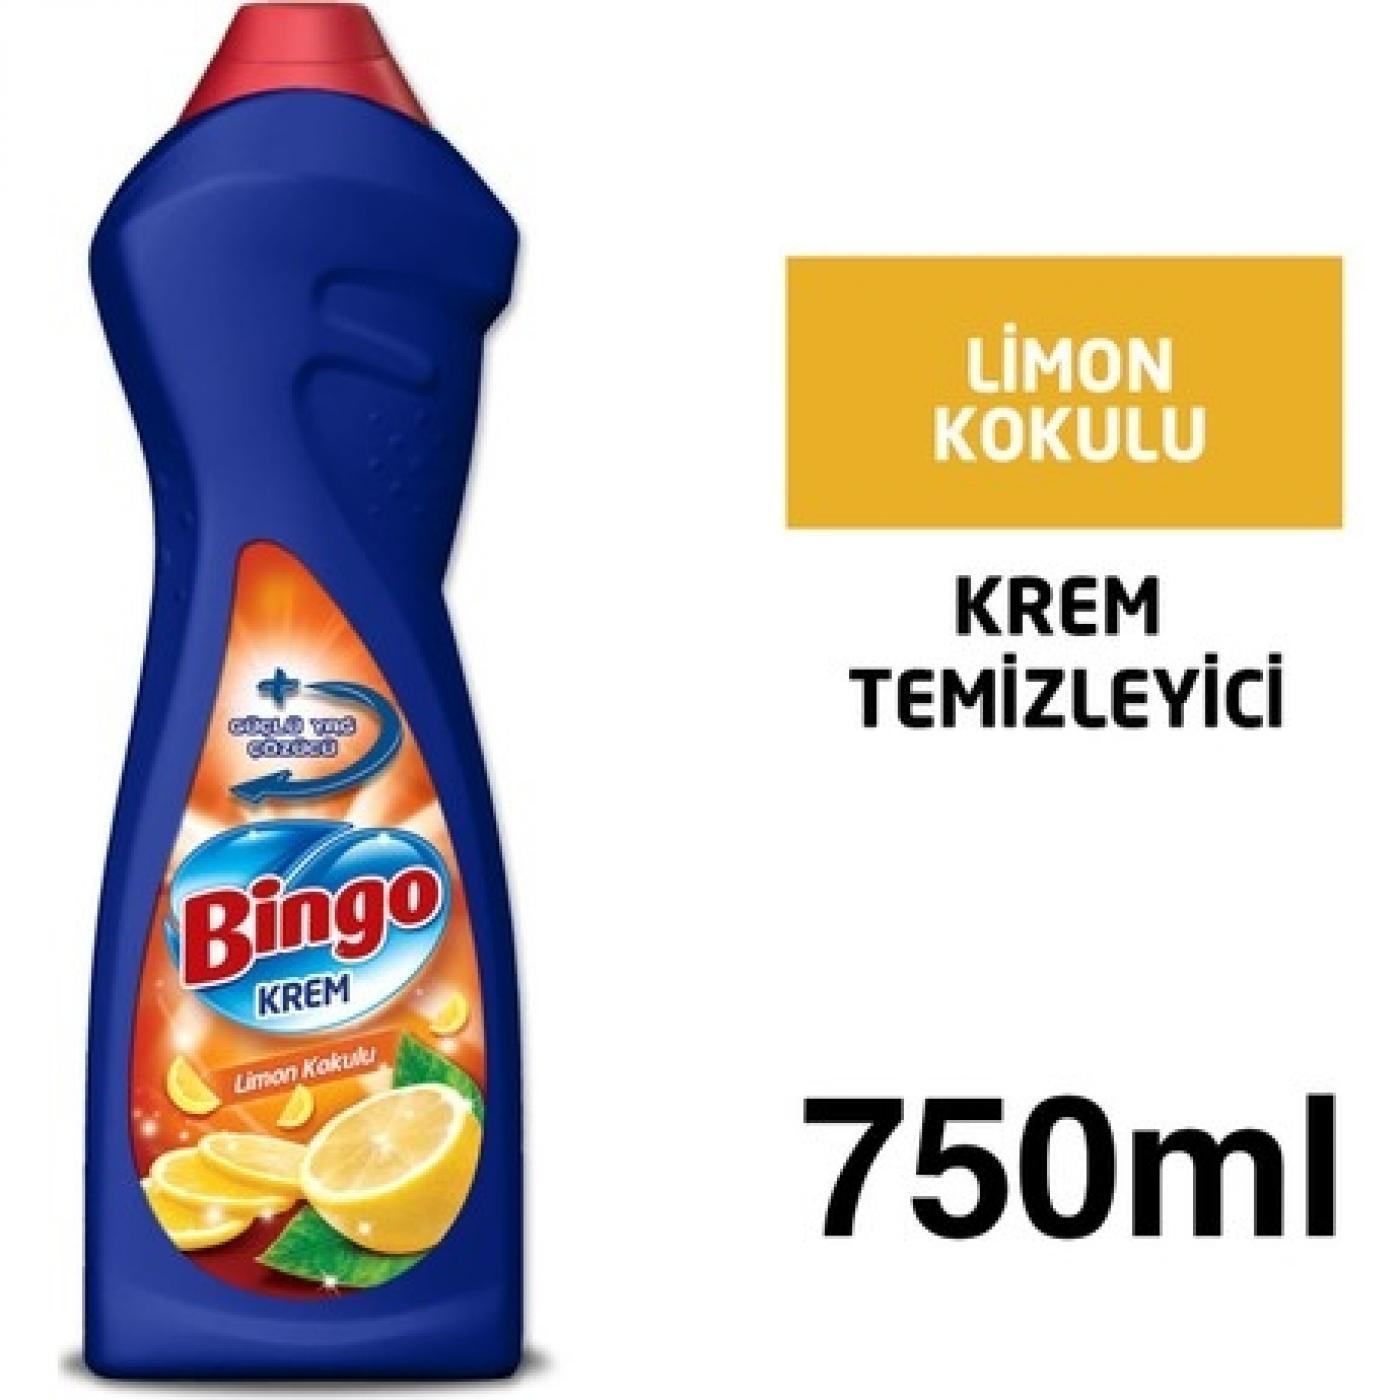 BİNGO KREM 750ML LİMON